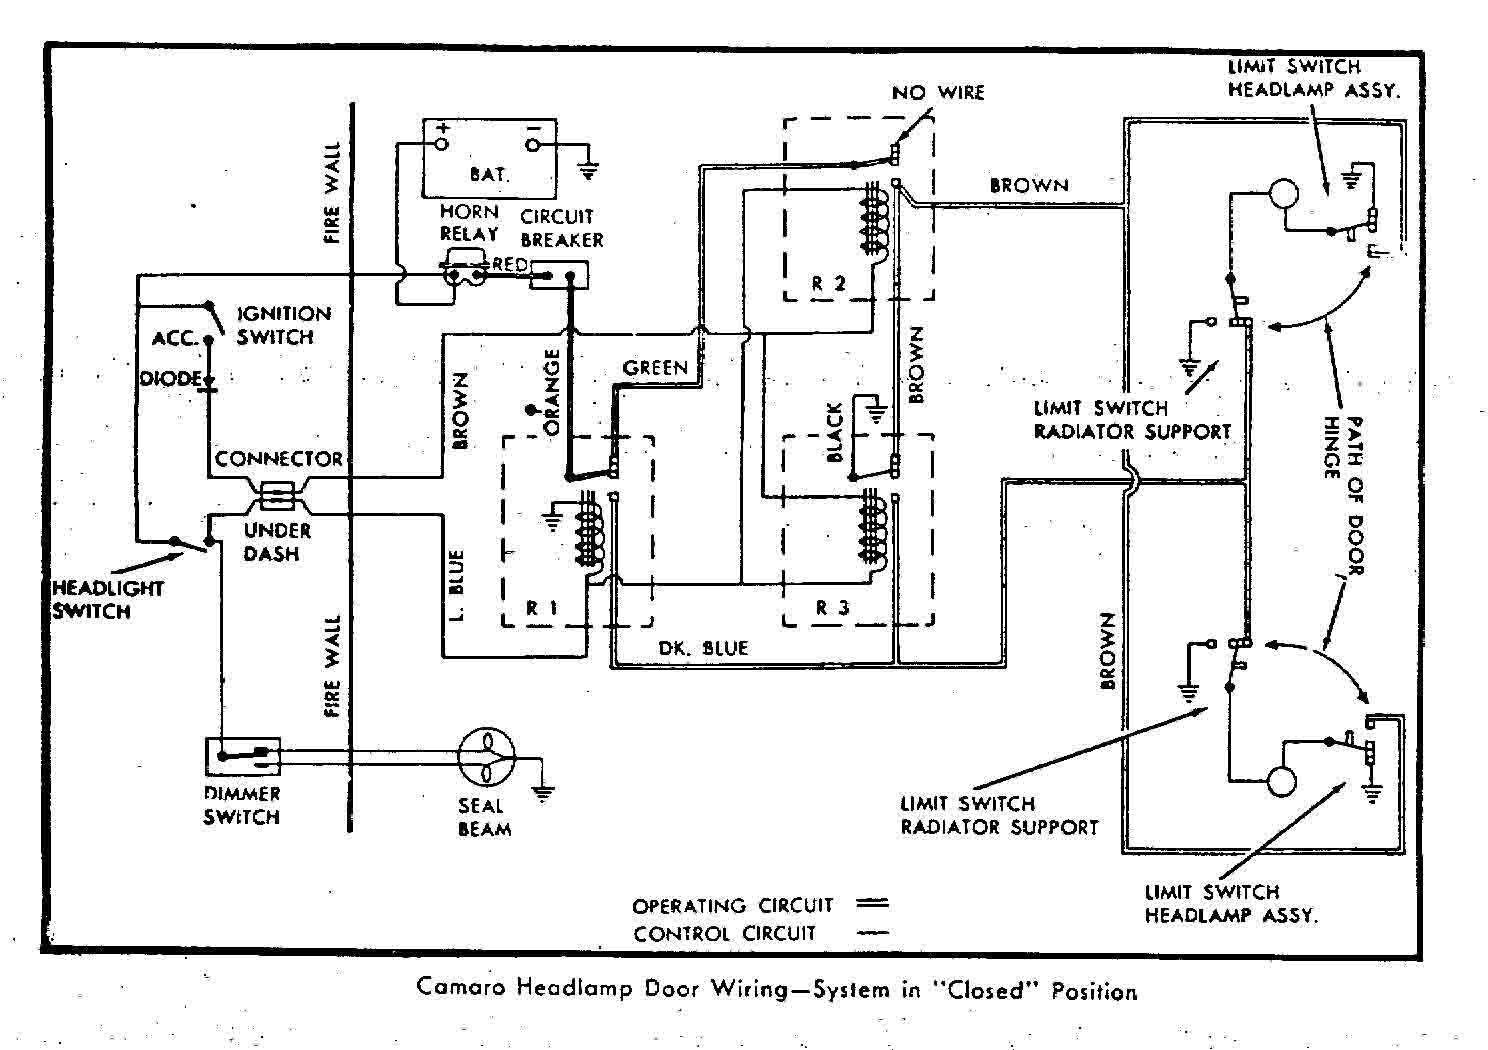 Outstanding 1967 Firebird Shifter Wiring Diagram Wiring Diagram Data Schema Wiring Cloud Icalpermsplehendilmohammedshrineorg